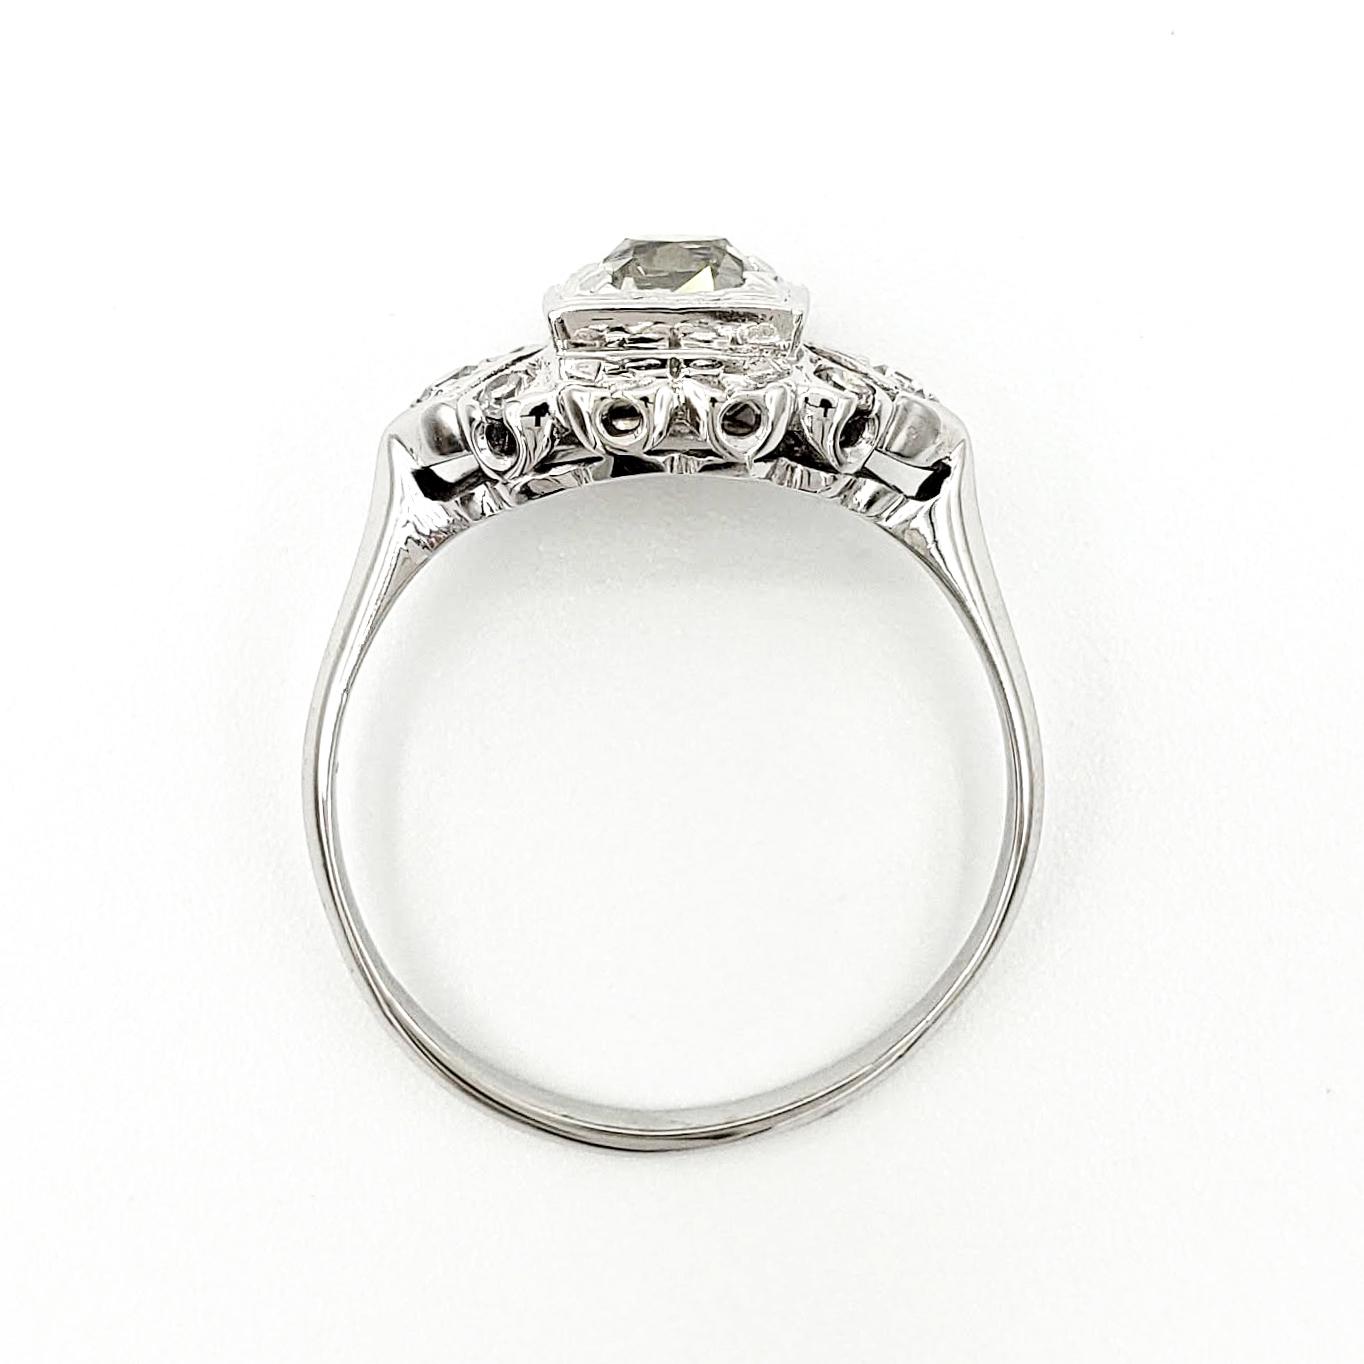 vintage-18-karat-gold-engagement-ring-with-0-86-carat-old-mine-cut-diamond-egl-k-si2